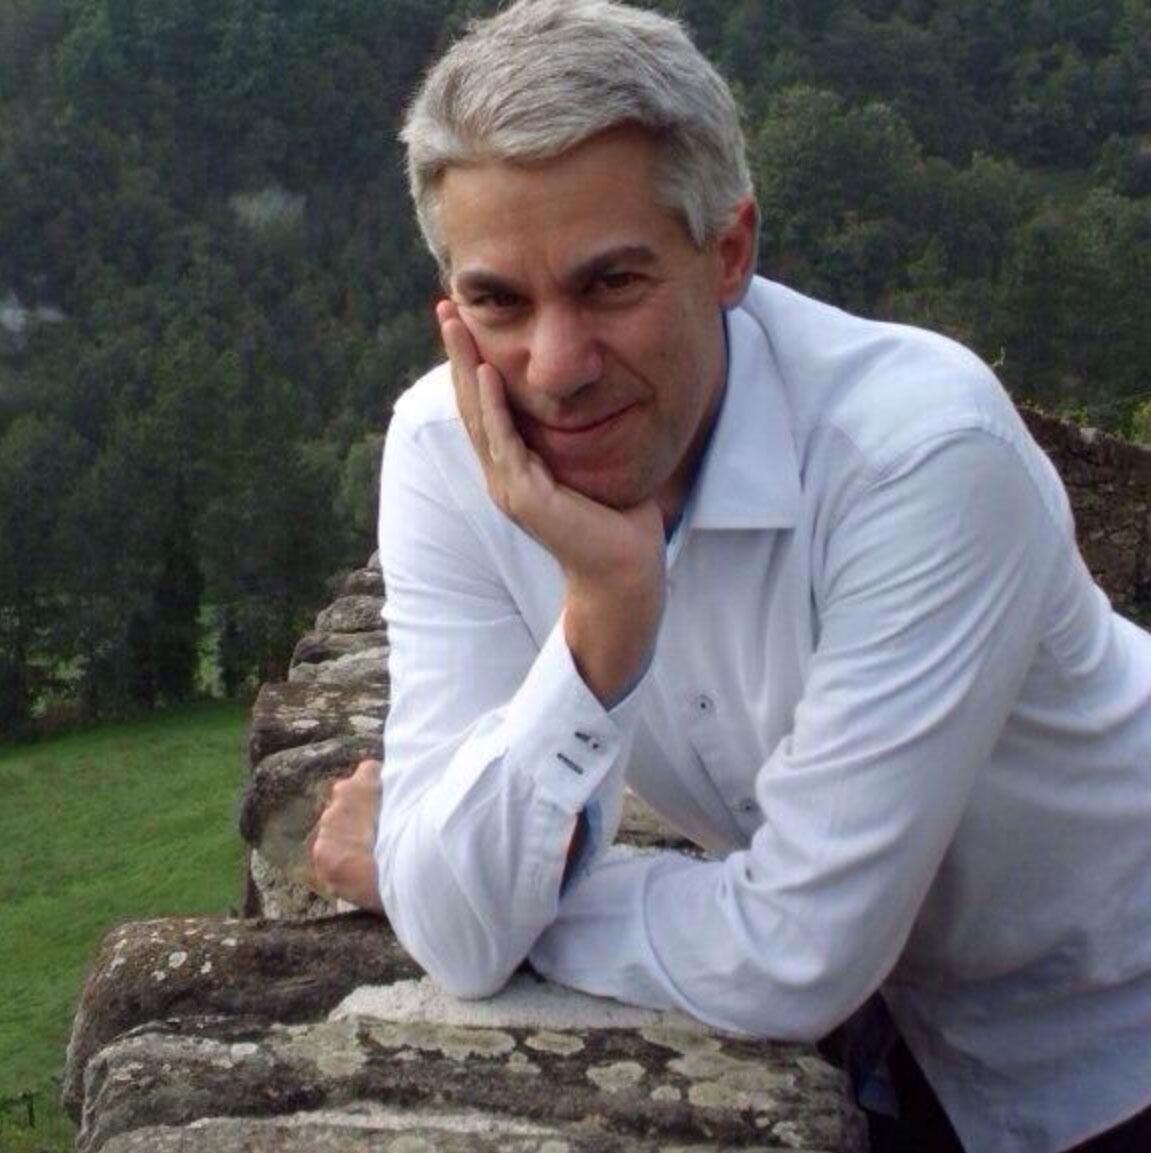 Mauro Bricca